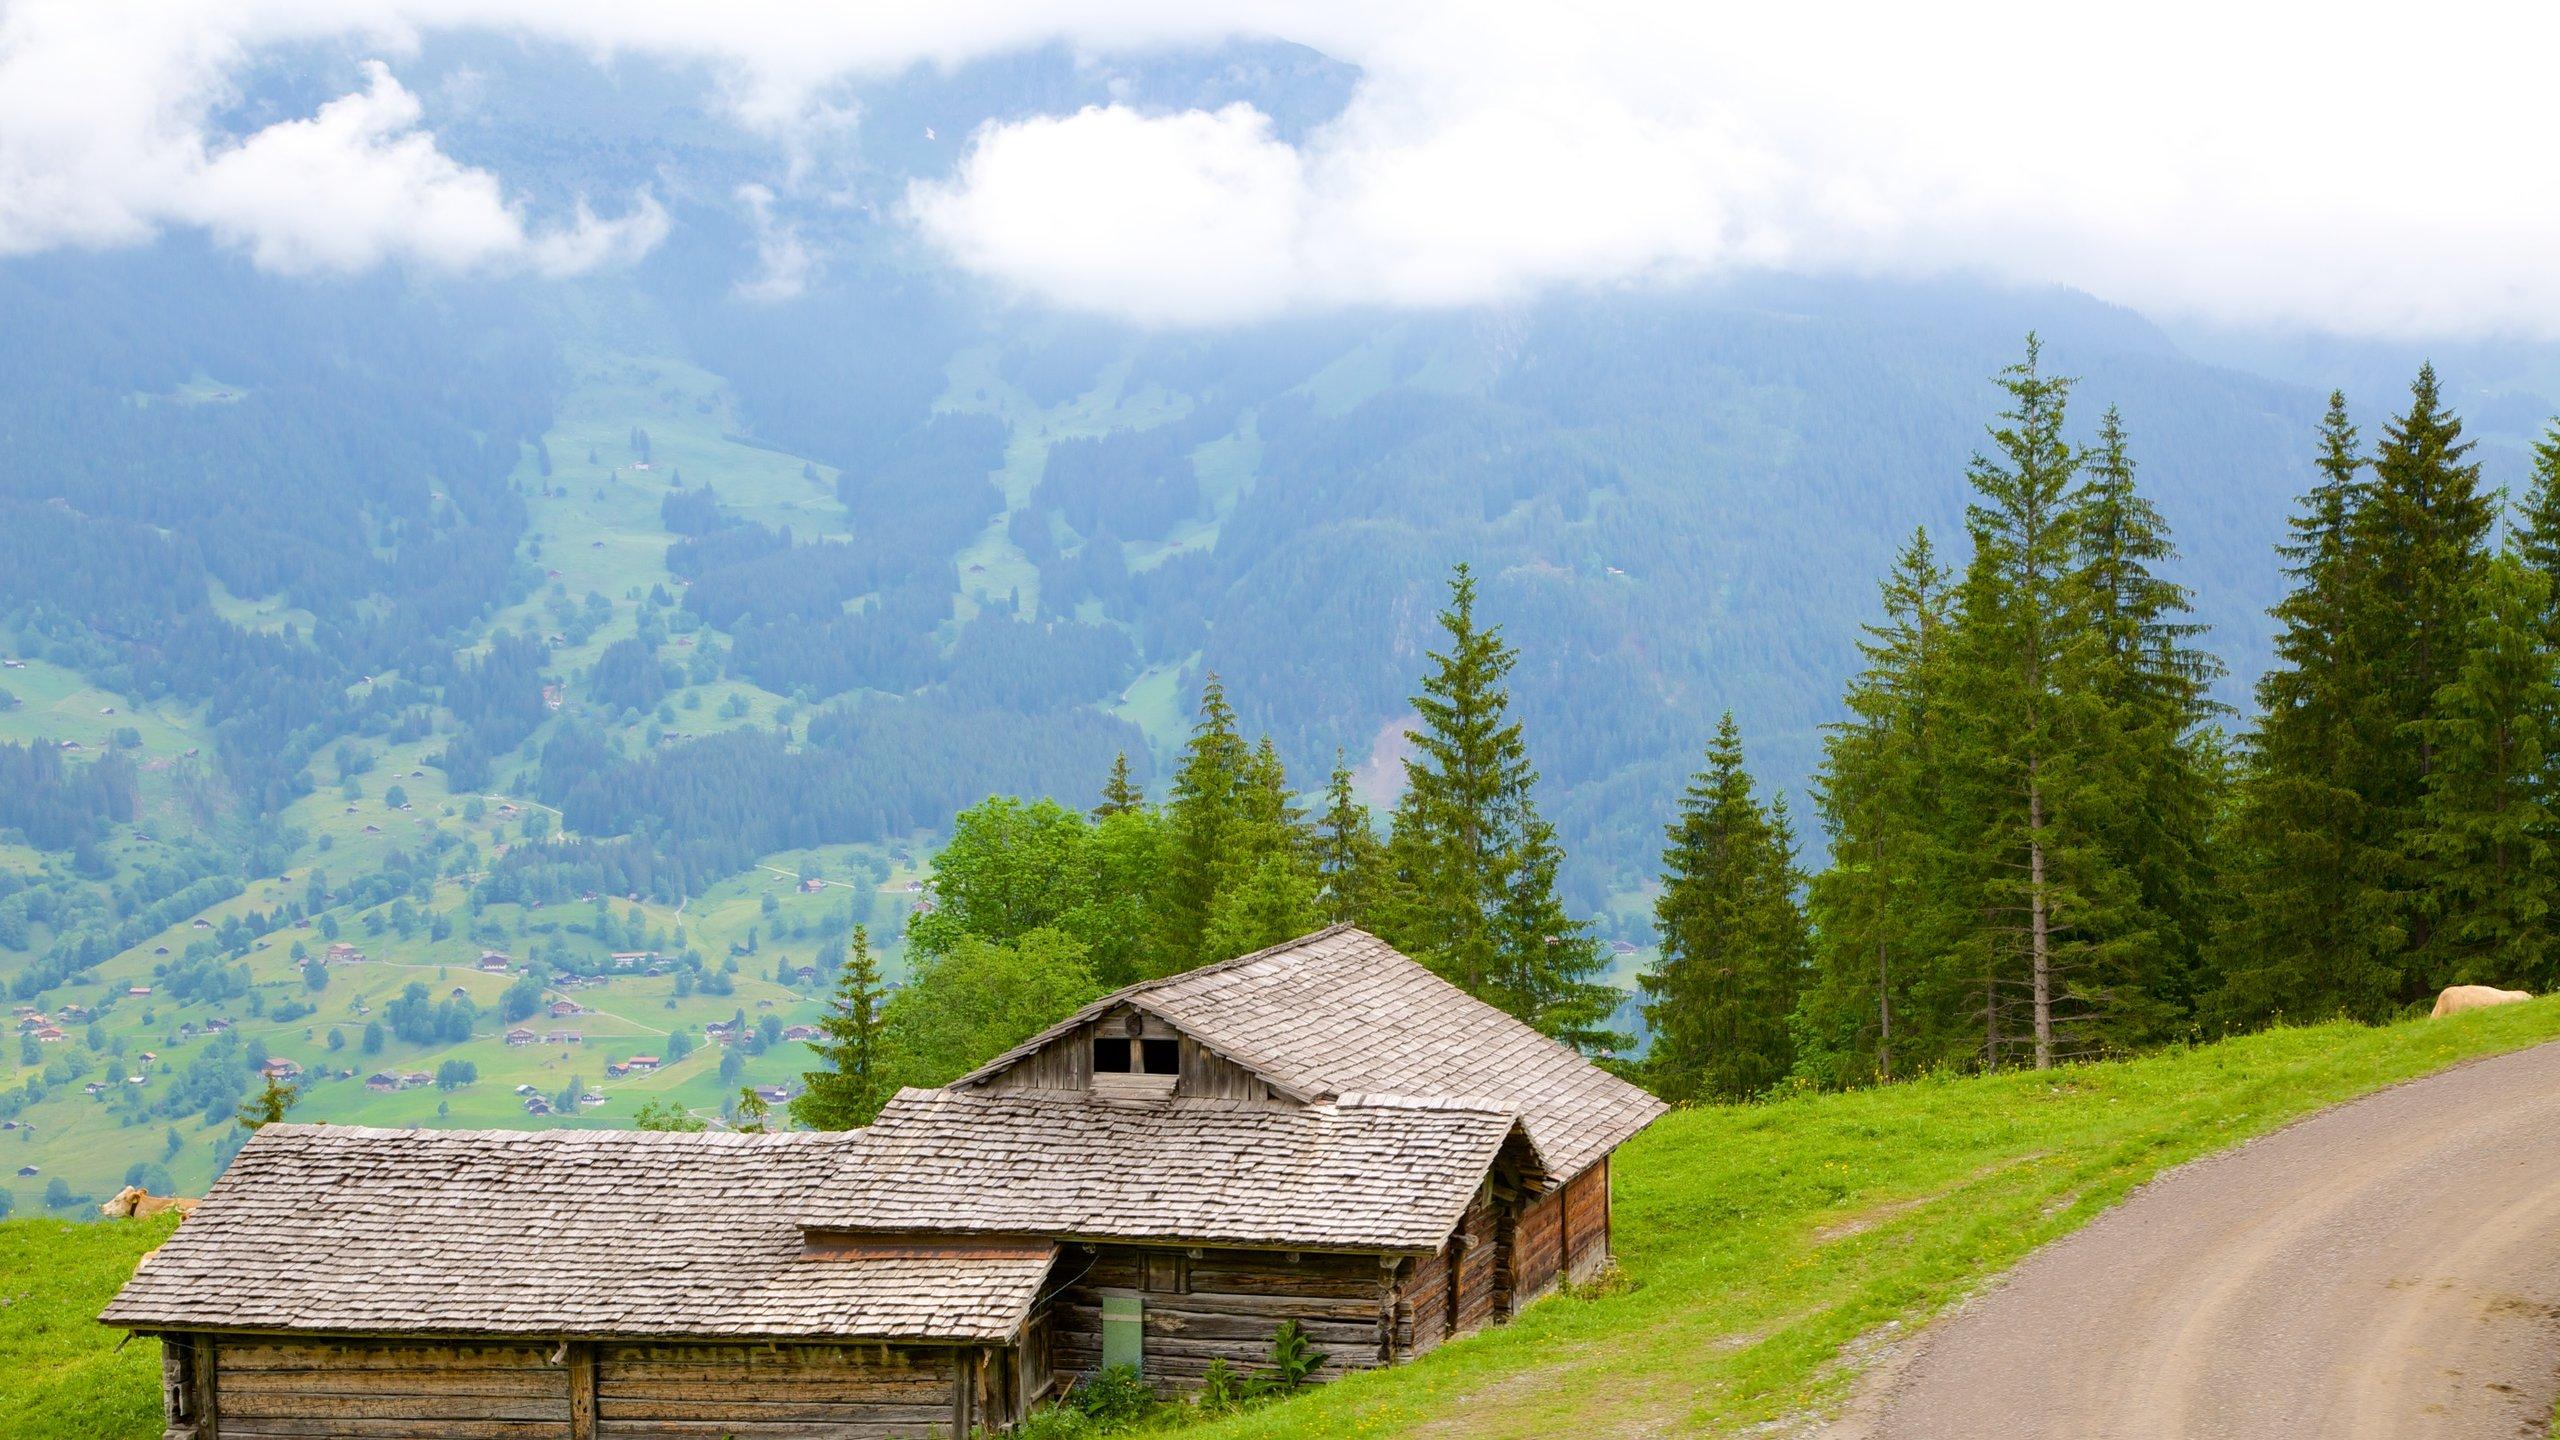 Interlaken-Oberhasli District, Canton of Bern, Switzerland